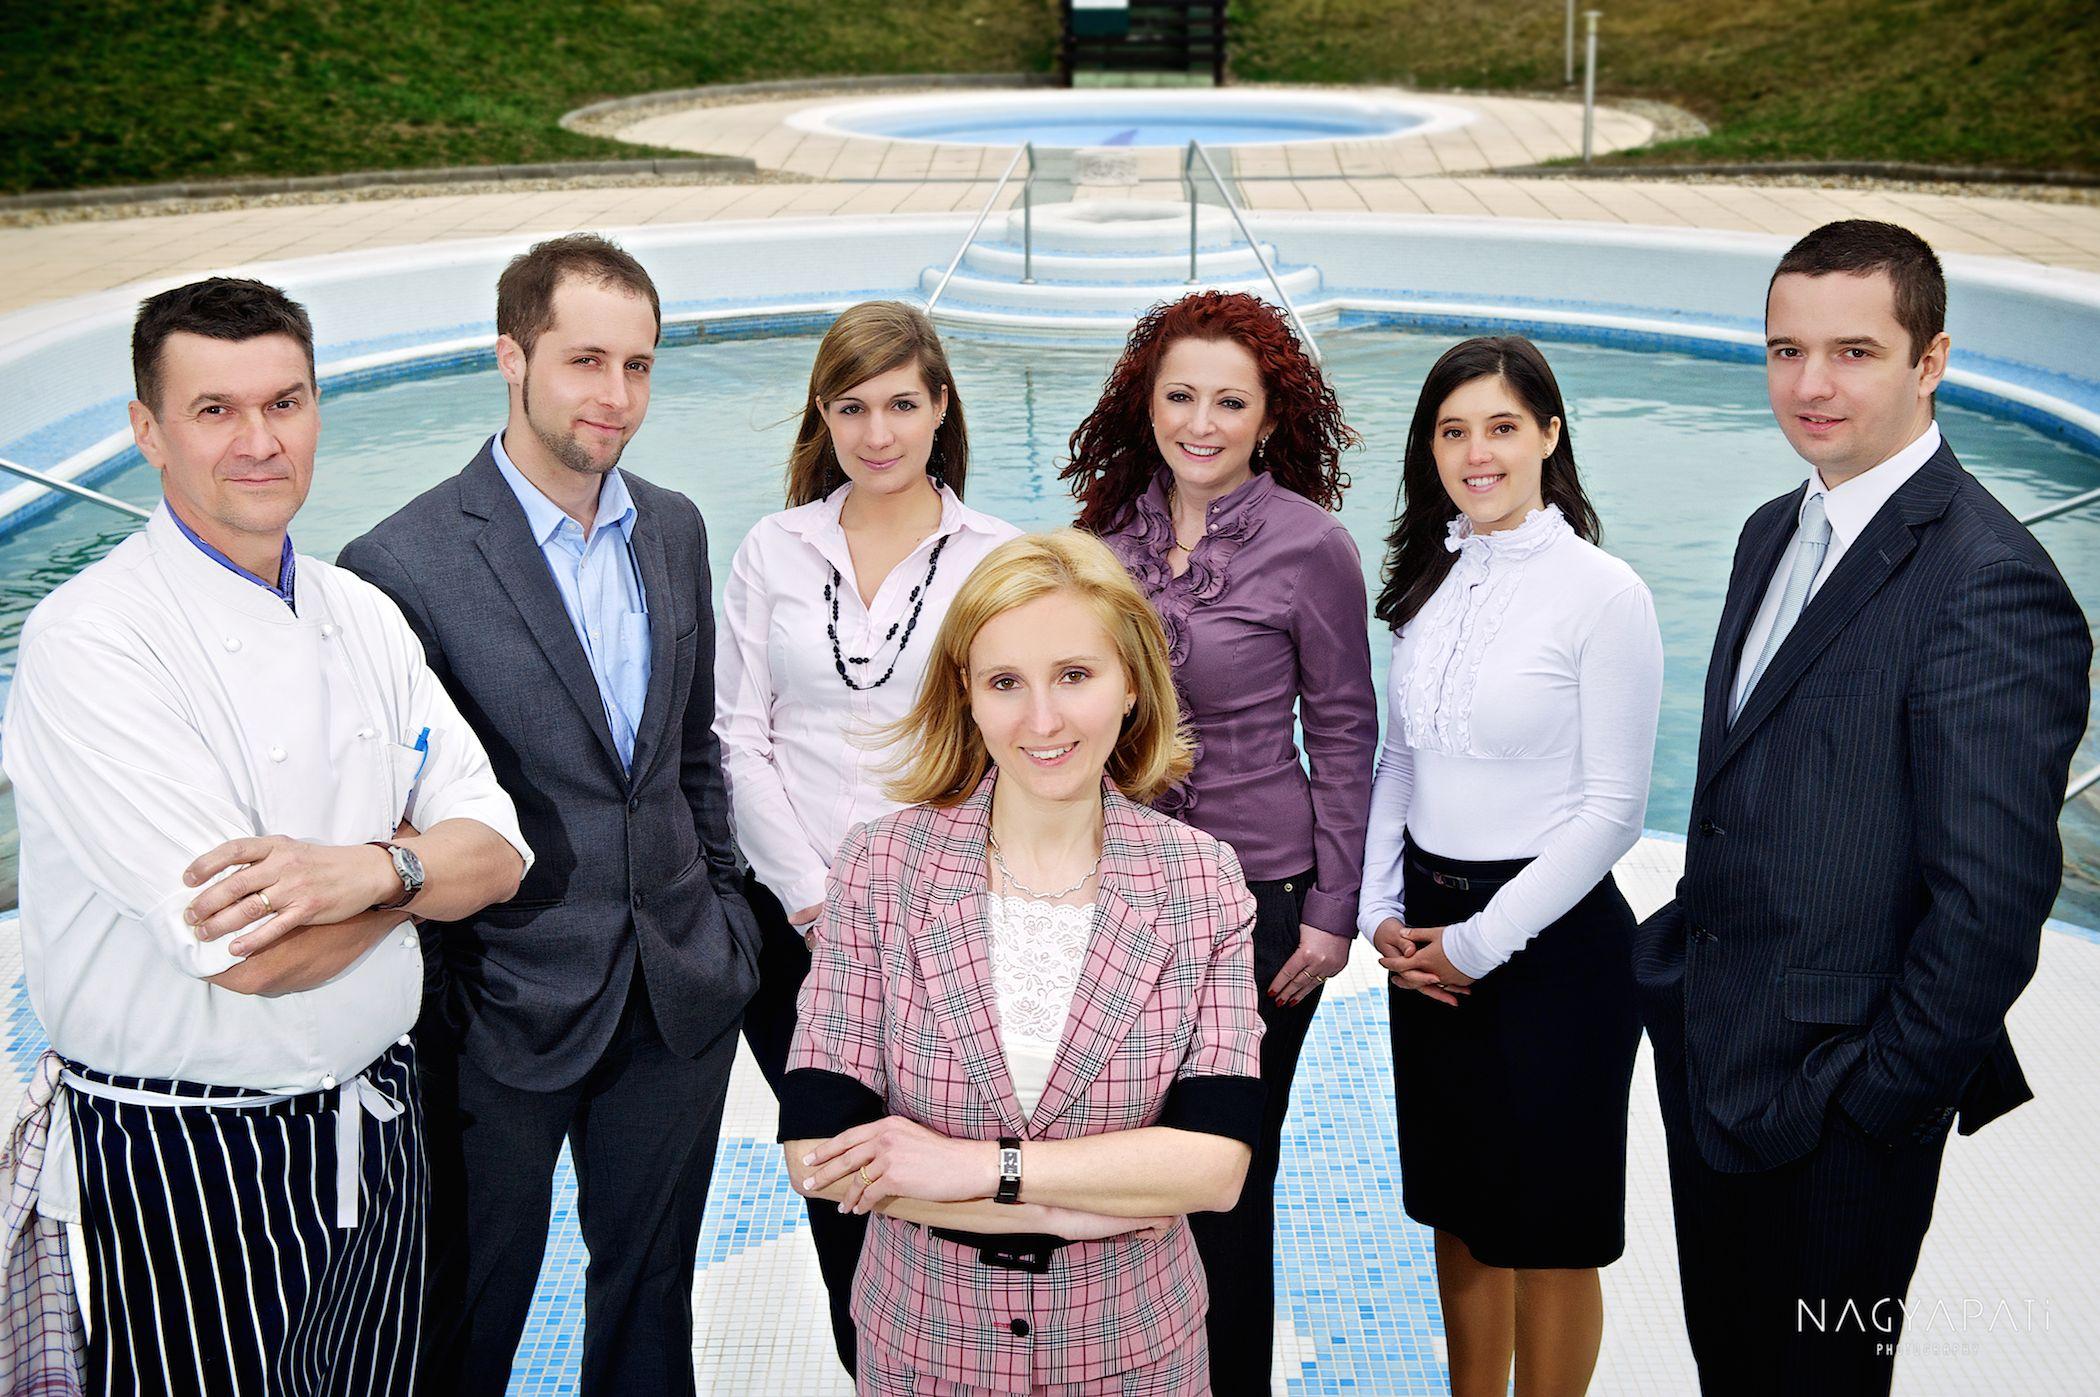 Petneházy-Team-Version-2